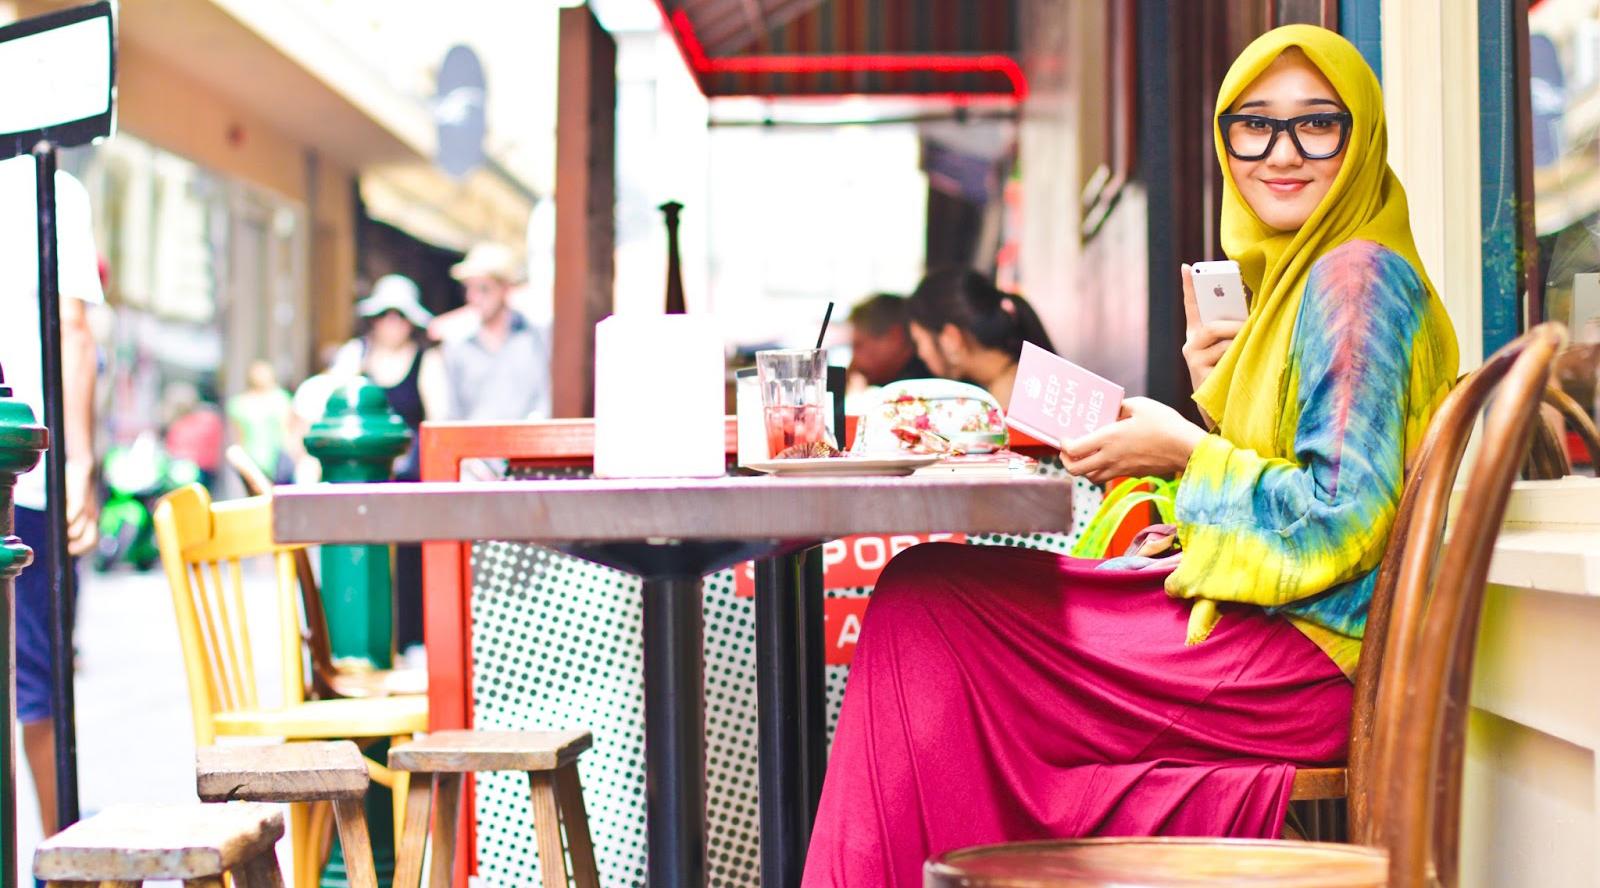 Liburan dan manis cewek cantik Hijab indonesia dian pelangi minum kopi di kafe